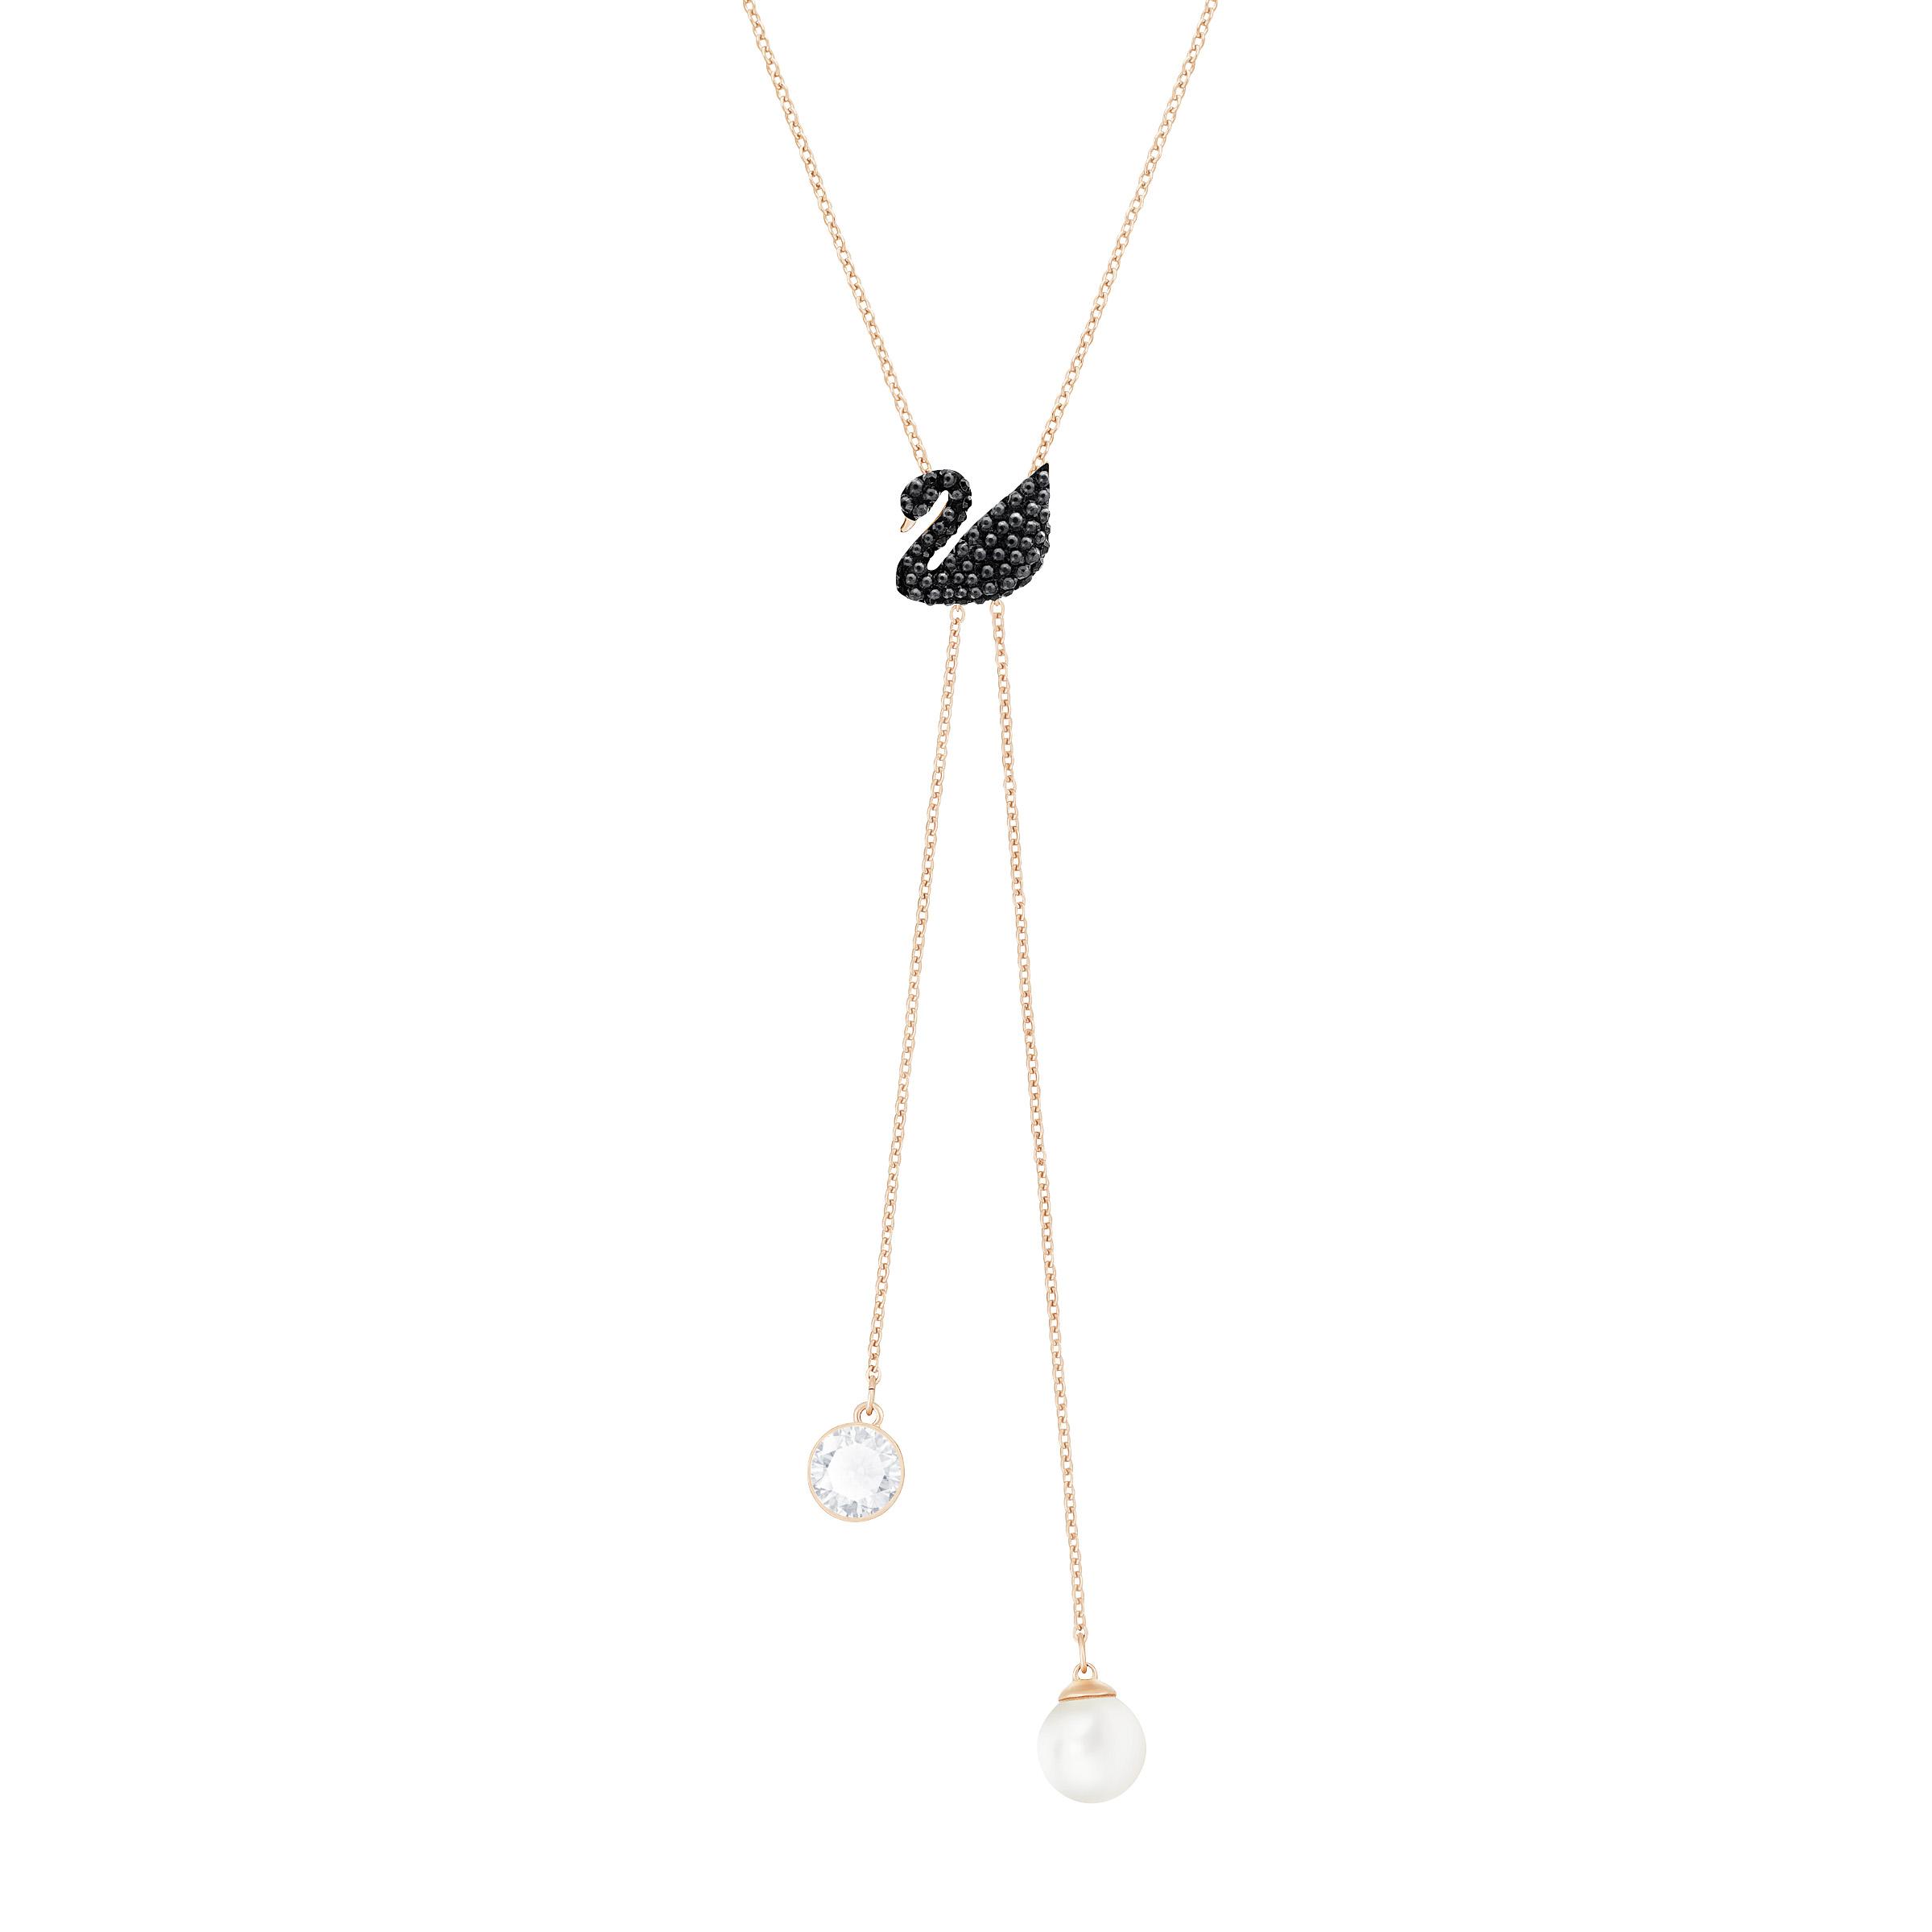 Collier en Y Swarovski Iconic Swan, noir, Métal doré rose, Swarovski